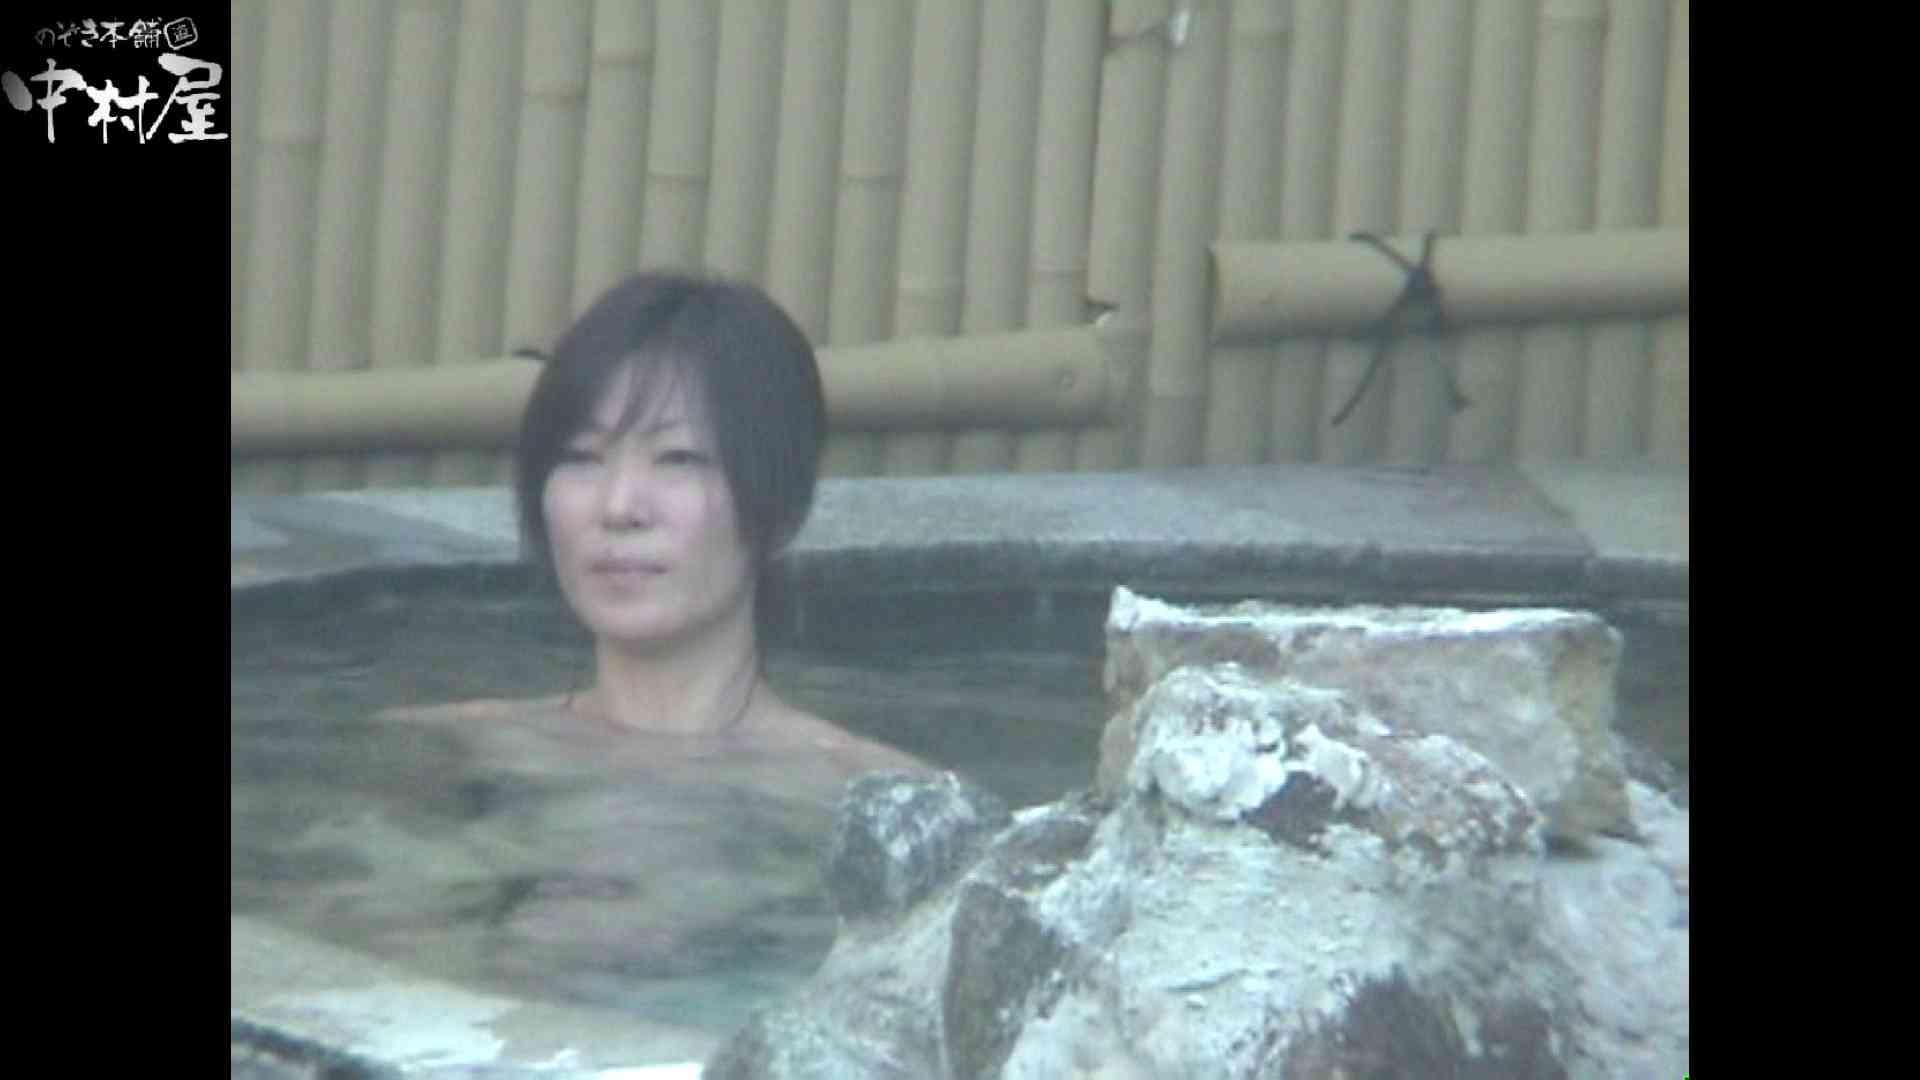 Aquaな露天風呂Vol.972 盗撮 おまんこ動画流出 80画像 26